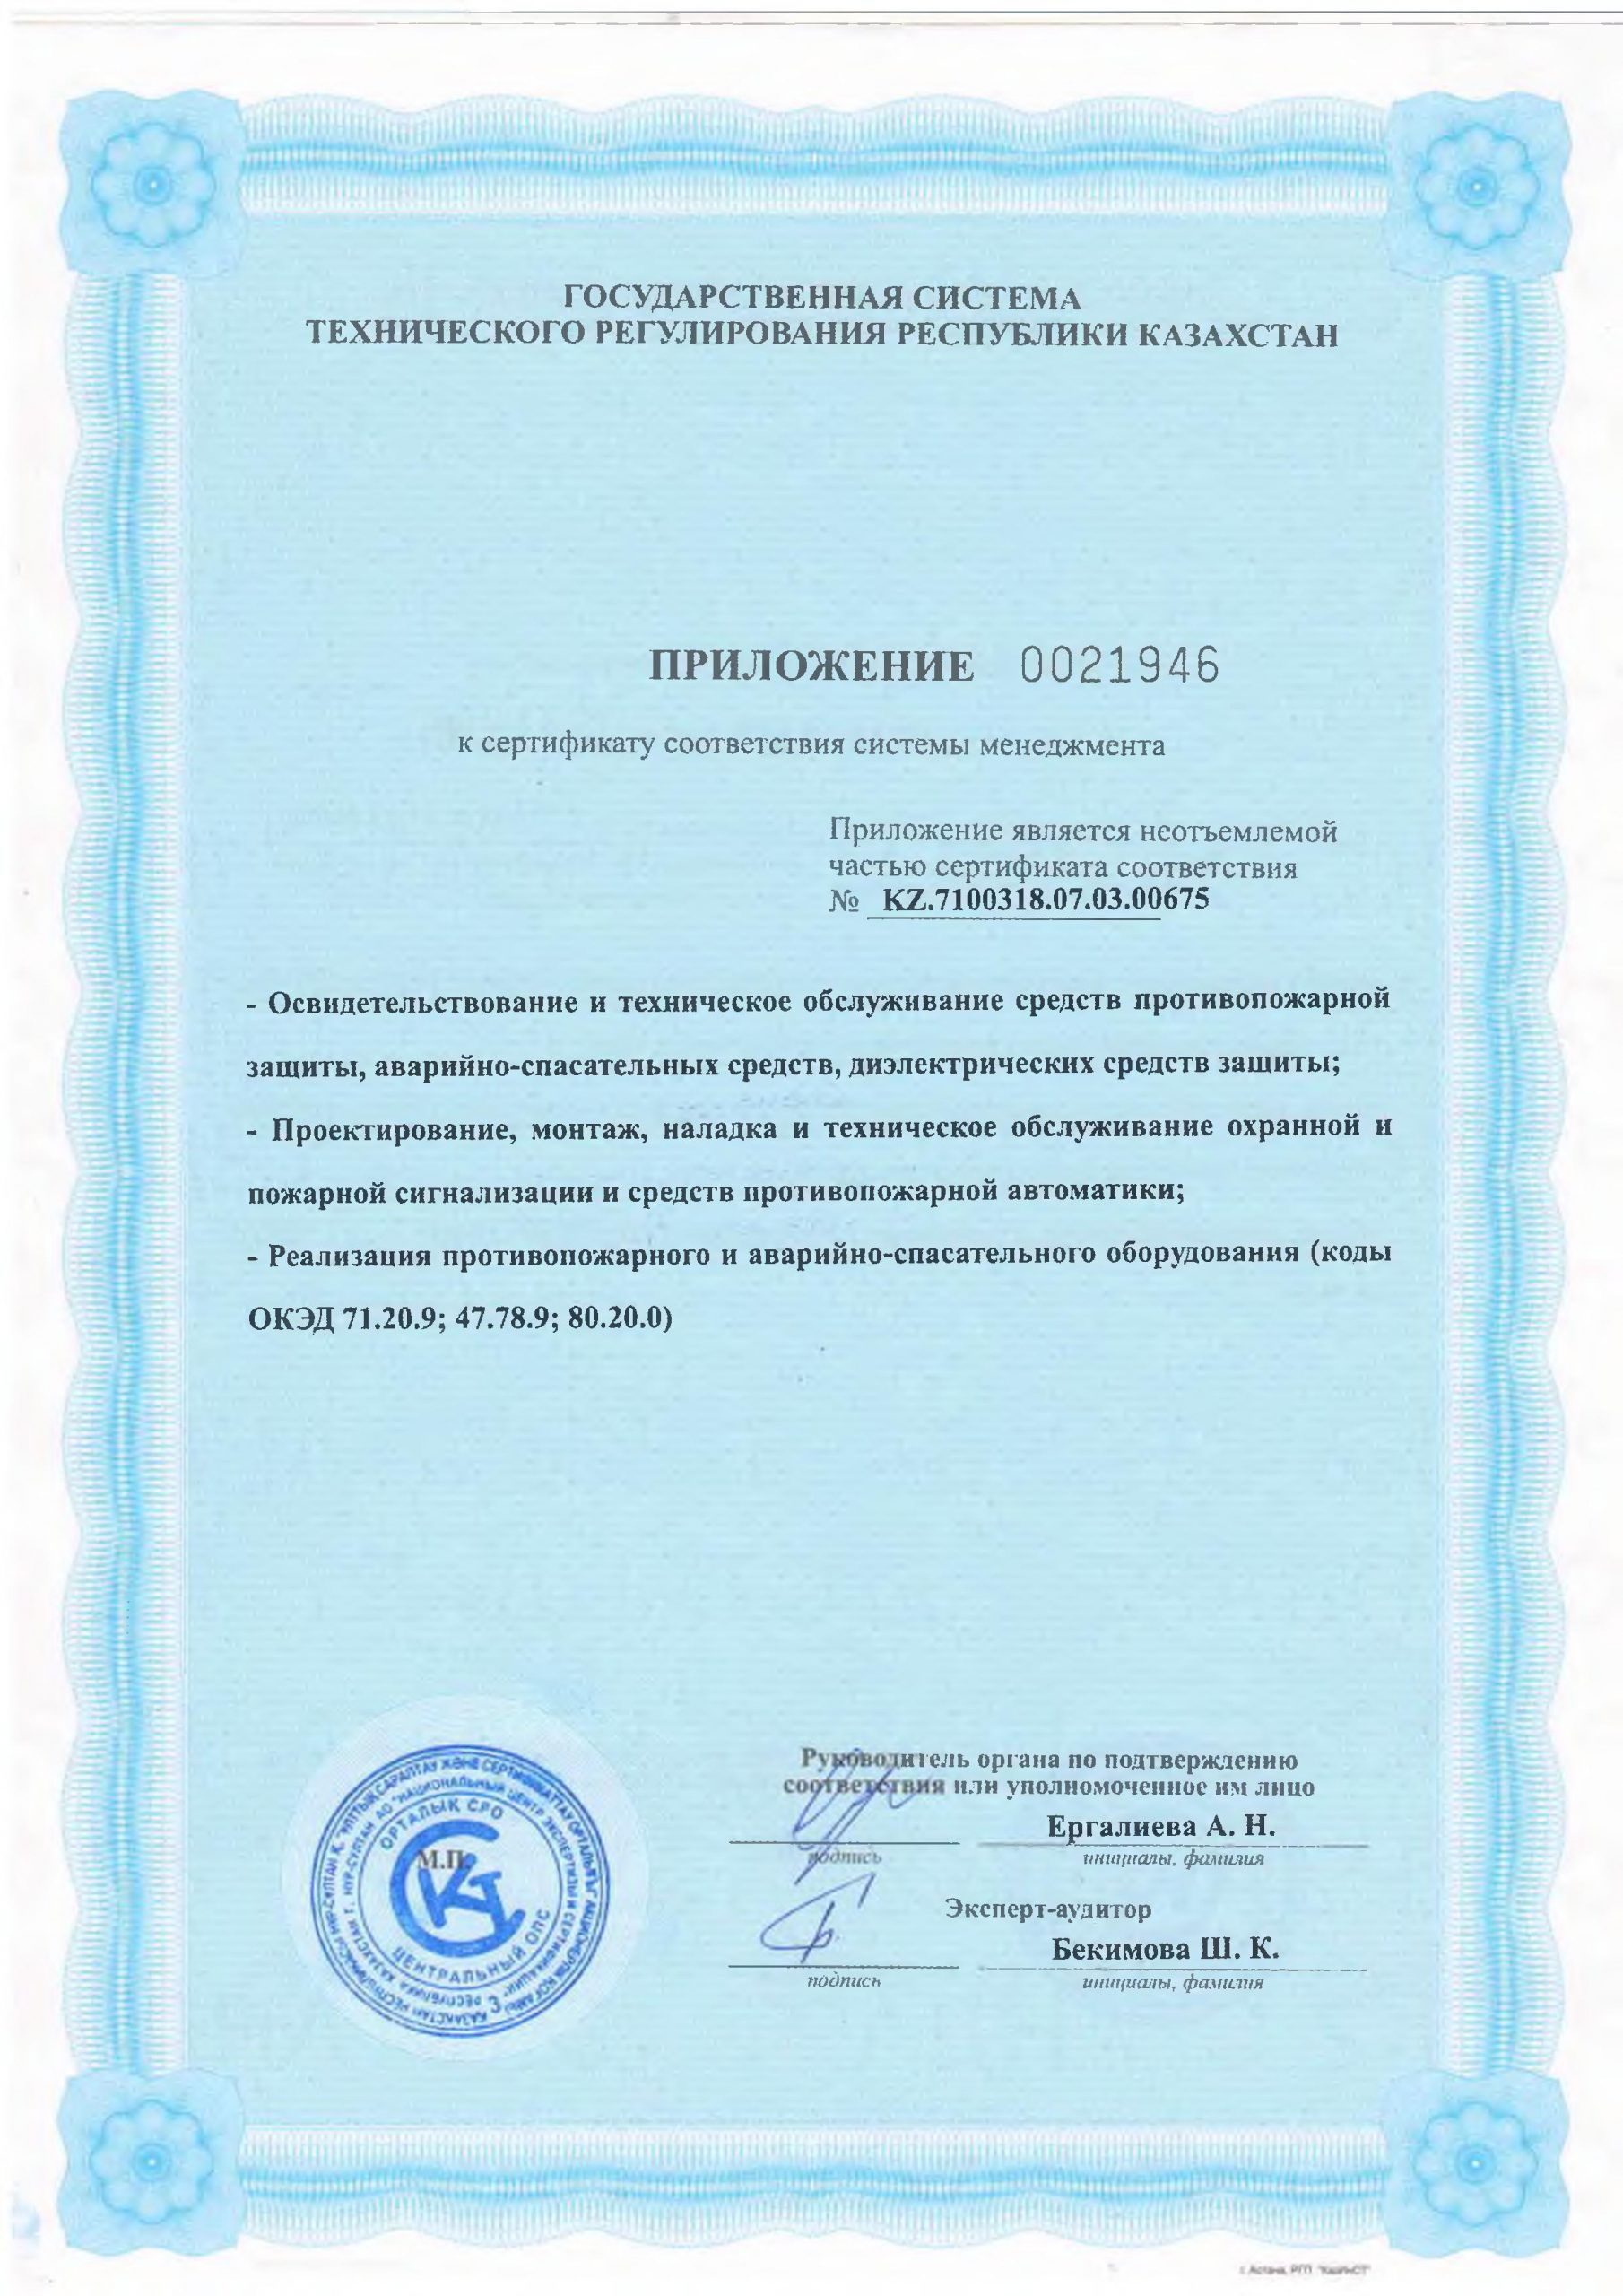 СТ РК ИСО 9001-2016 до 25.09.2021 - 0004